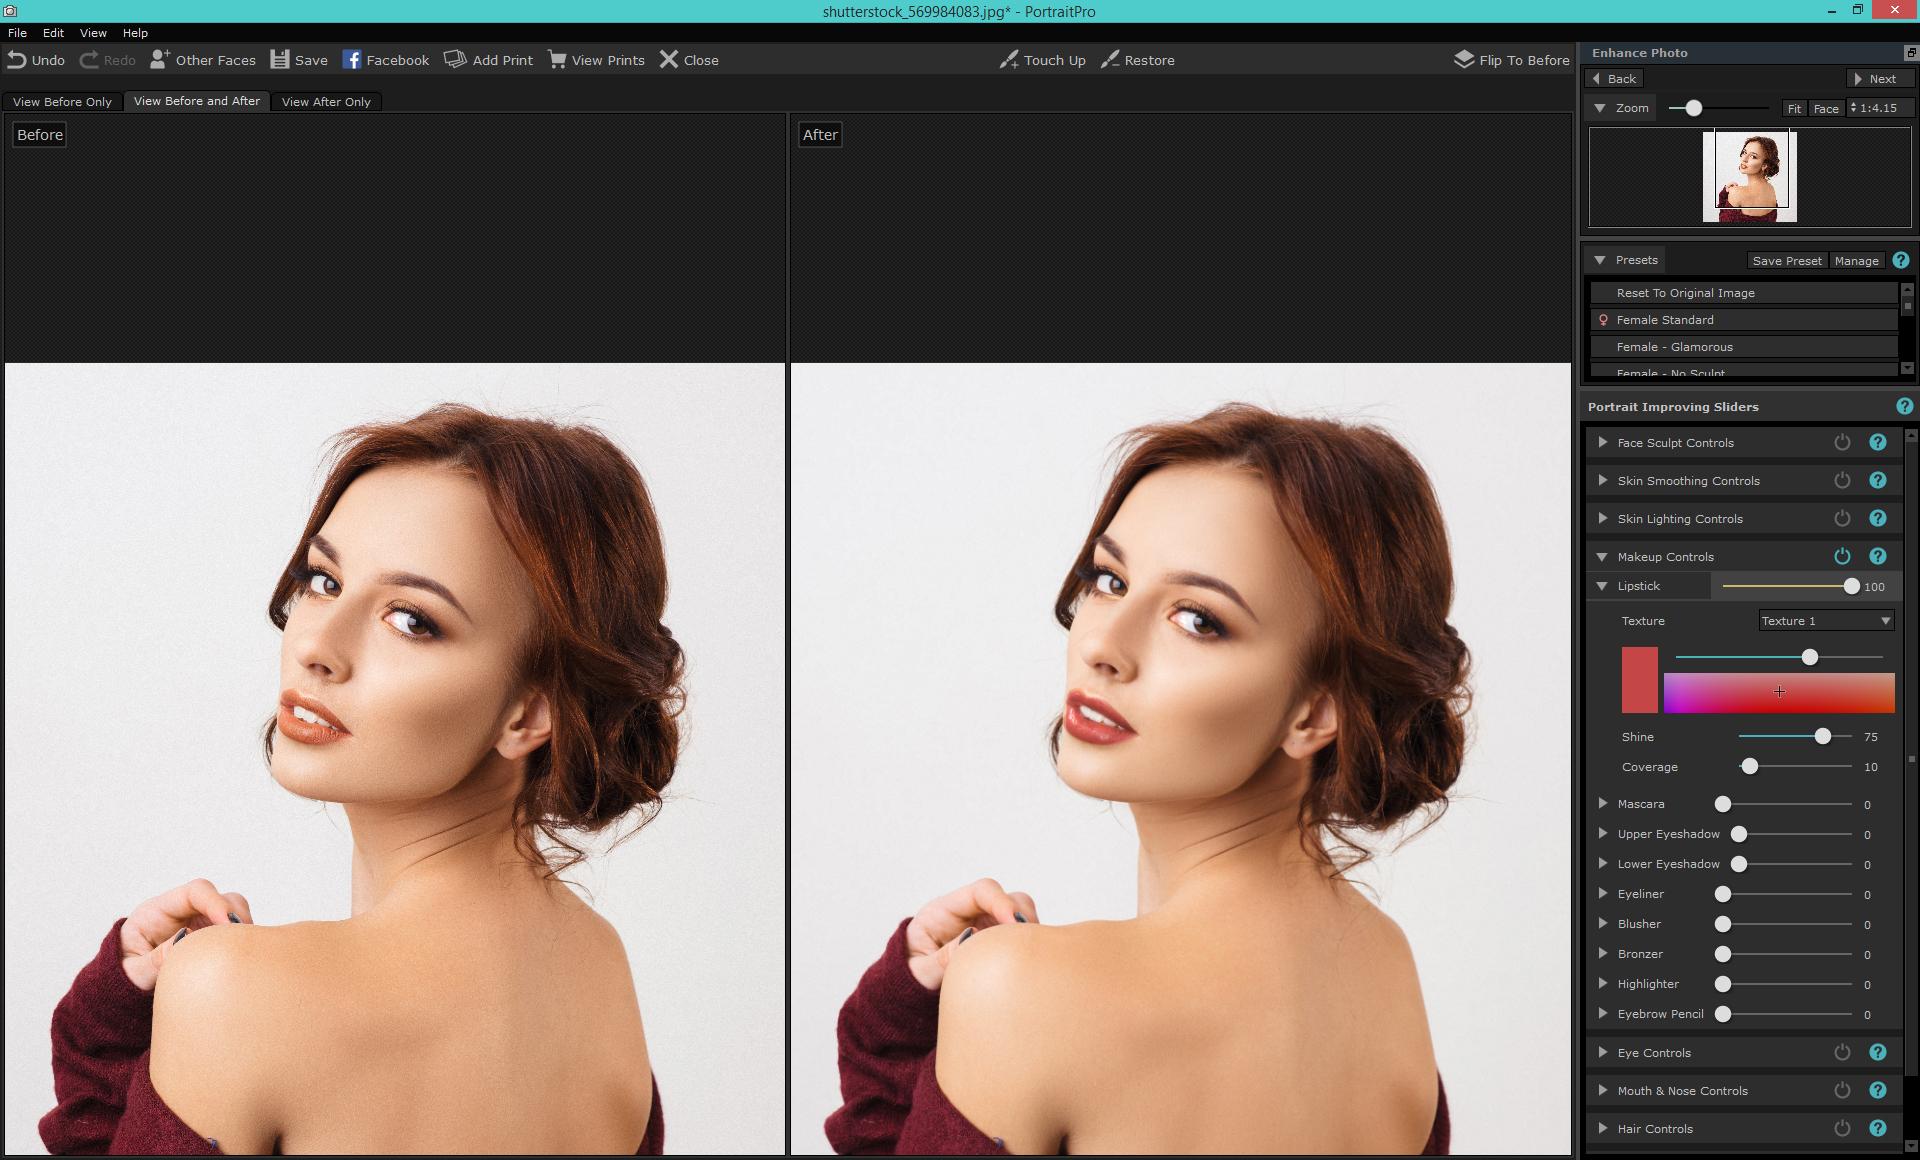 Applying Digital Make Up Tutorial Portraitpro Blog